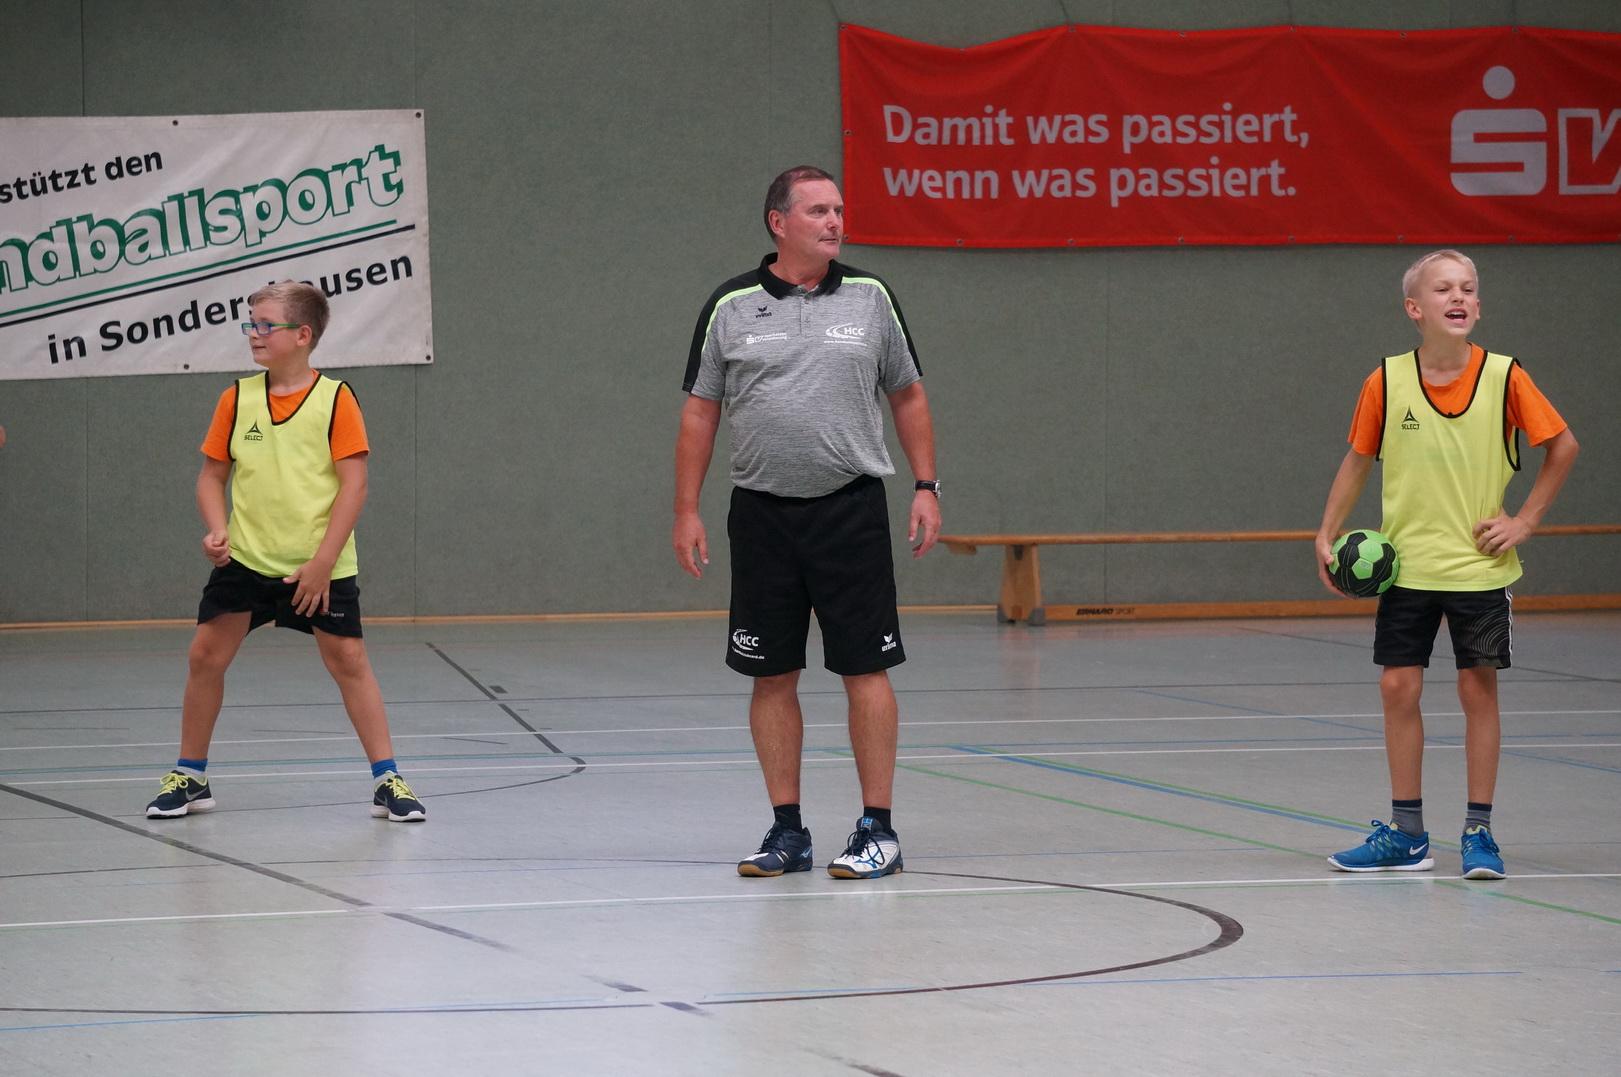 201808_Handballcamp_SDH_MG_114w